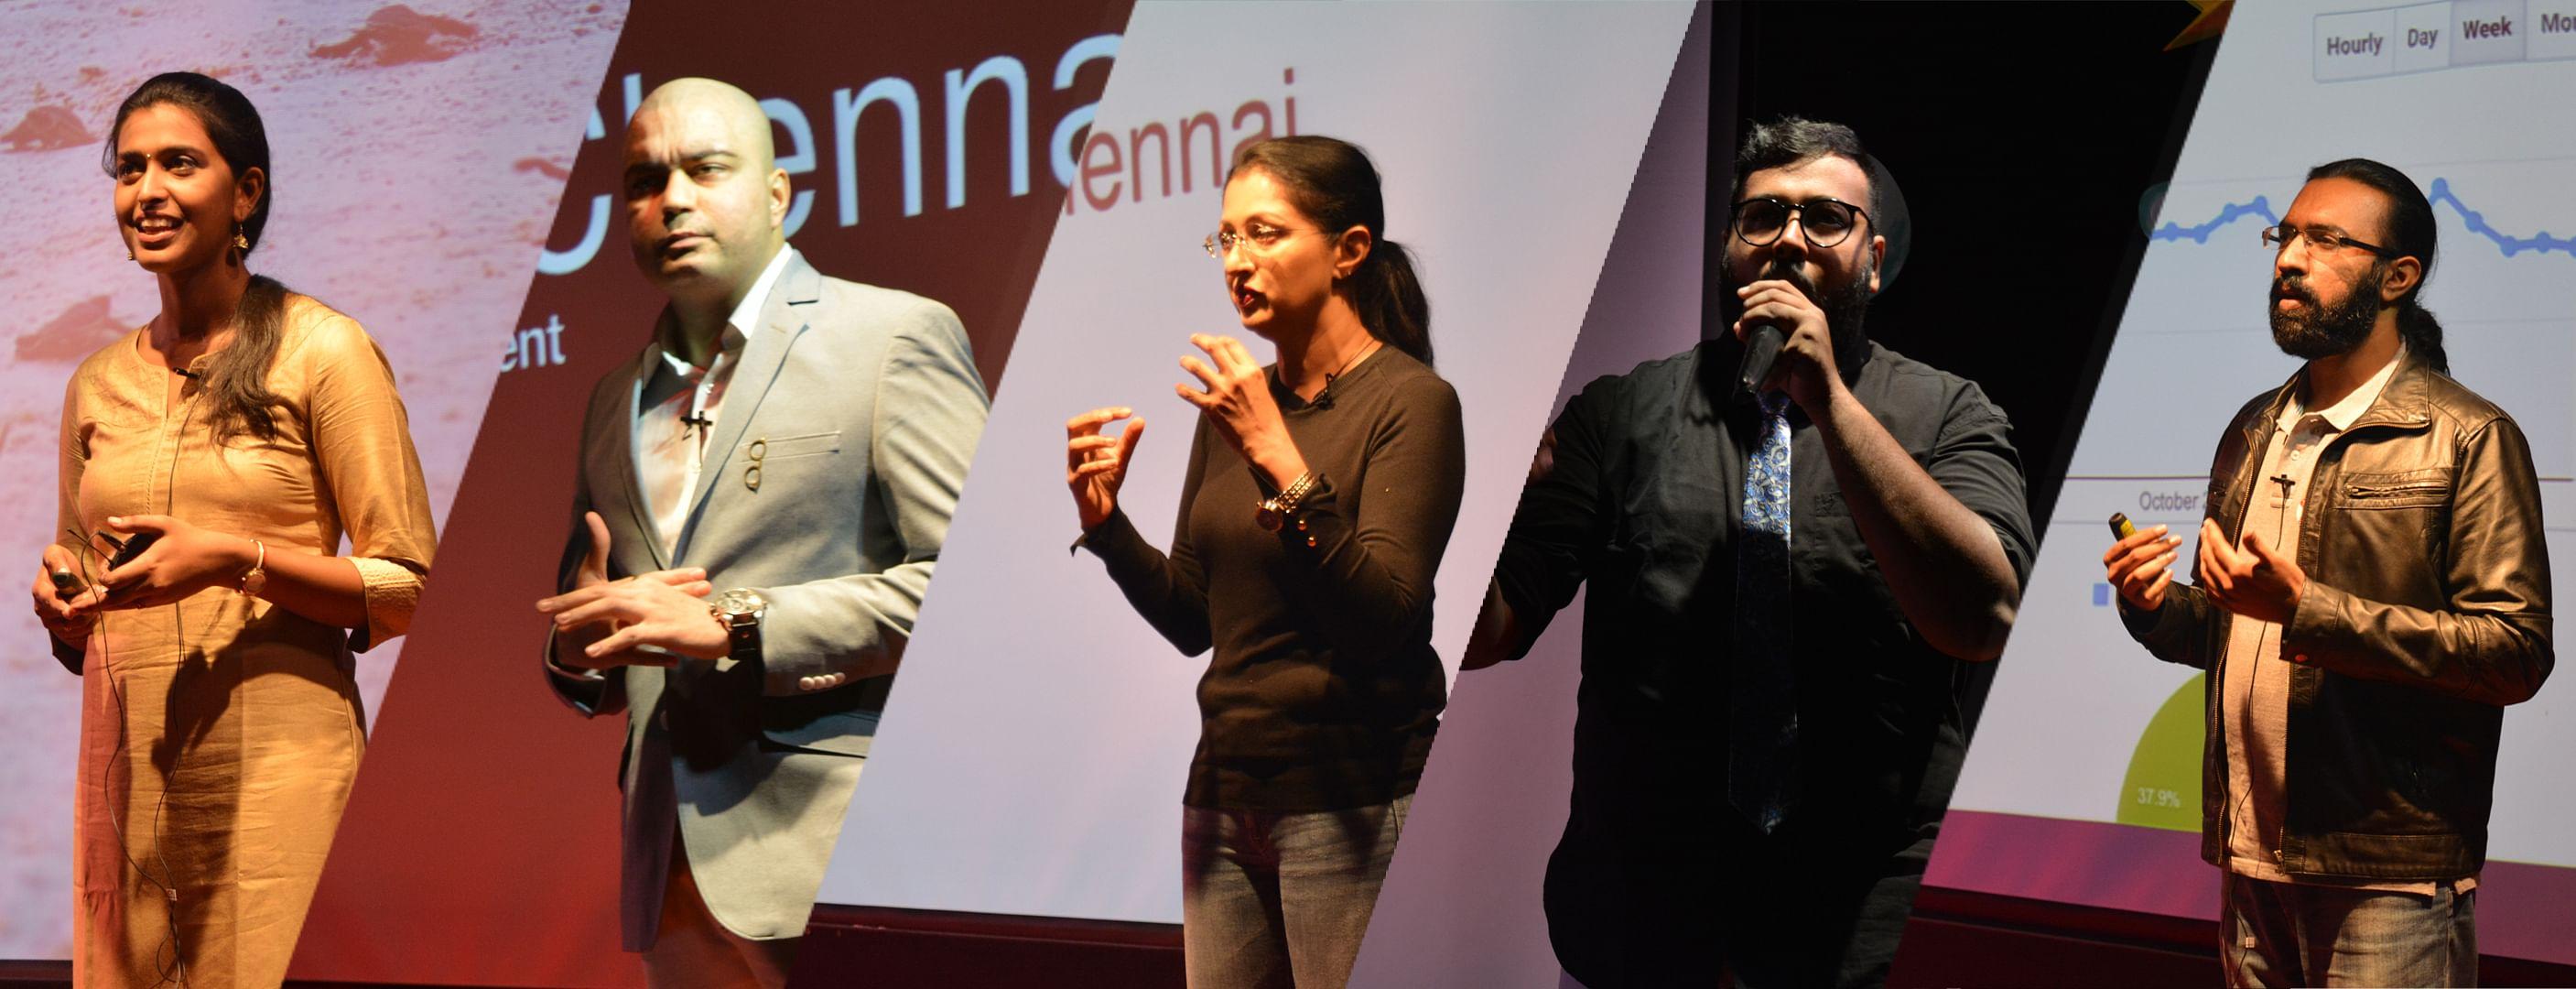 Speakers at TEDxGLIMChennai 2018 - From left: Mohana Arun, Kartikey Sharma, Gautami Tadimalla, Bharadwaj Balaji, Deepak Kanakaraju